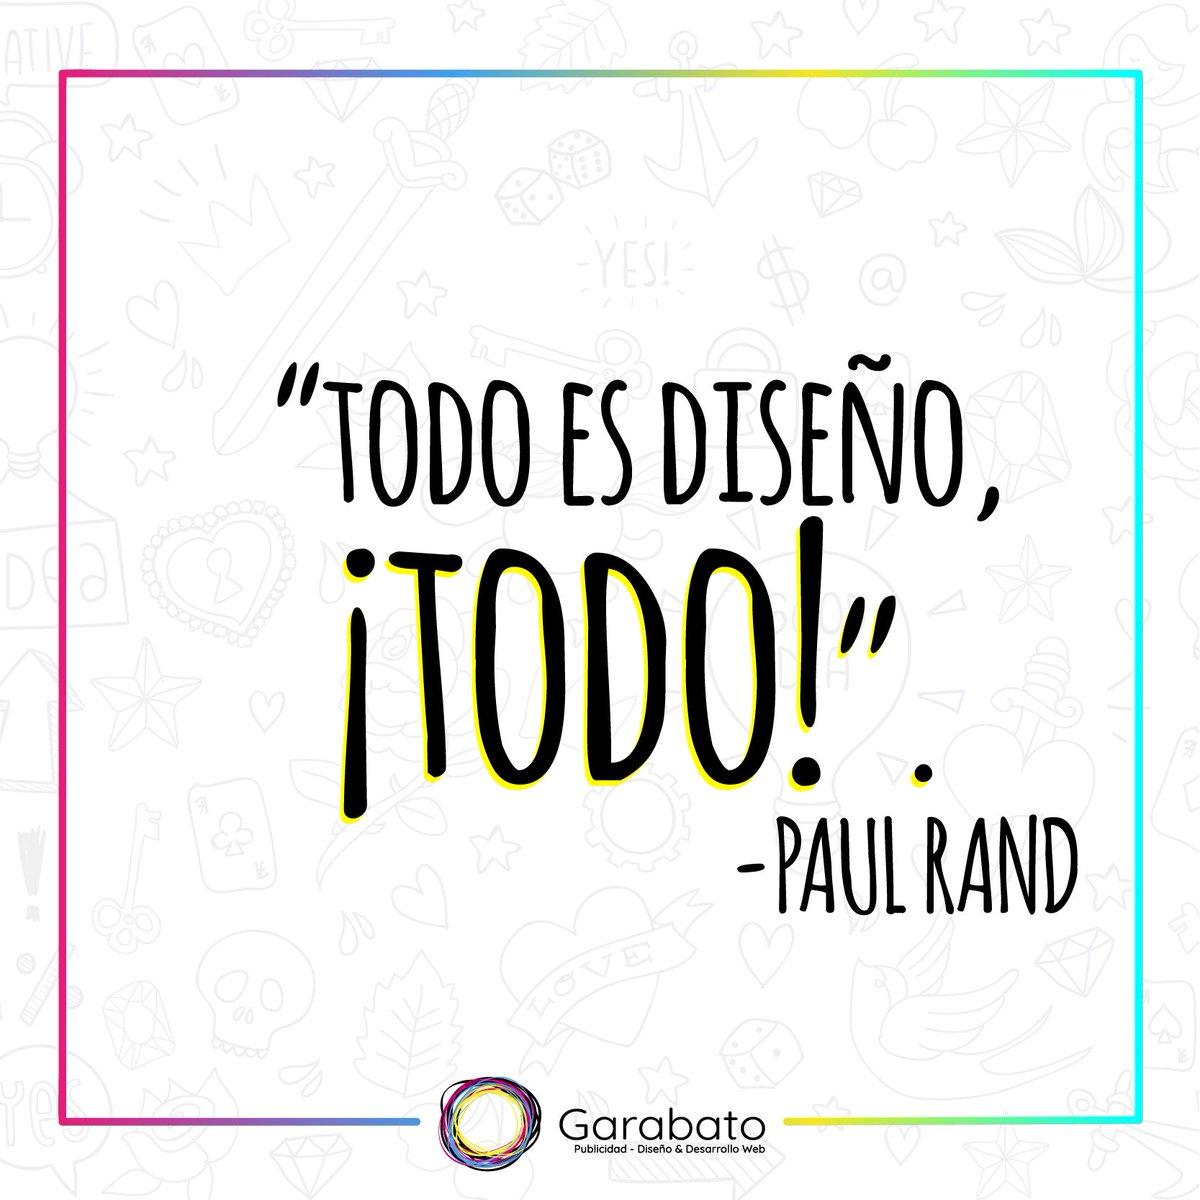 Garabato A Twitter Paul Rand Diseñador Gráfico Reconocido